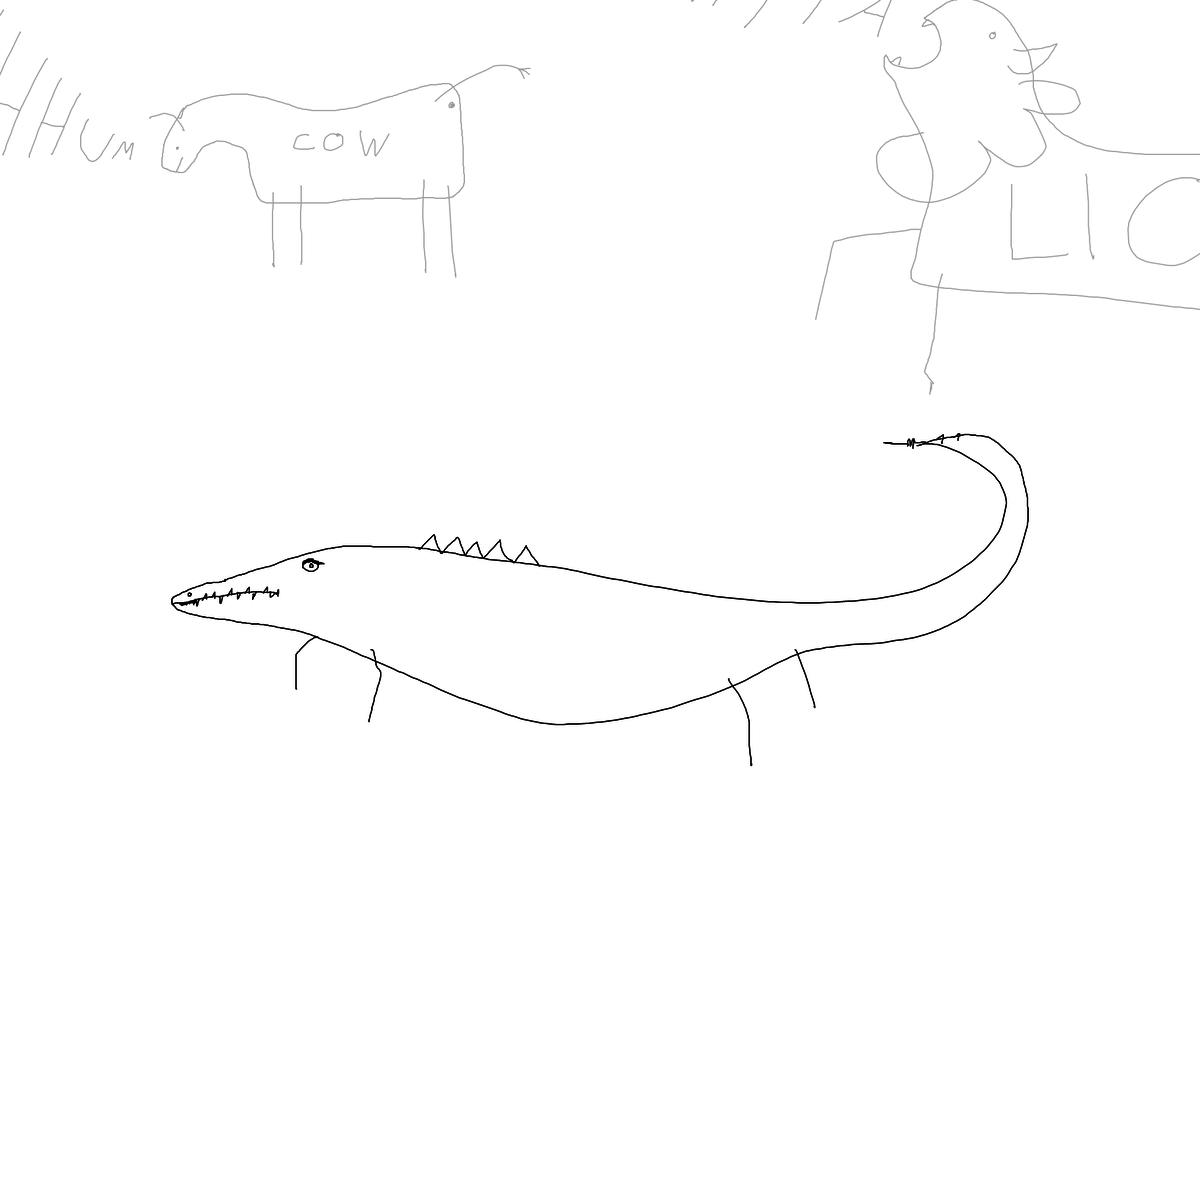 BAAAM drawing#2147 lat:52.4750022888183600lng: 13.4068489074707030